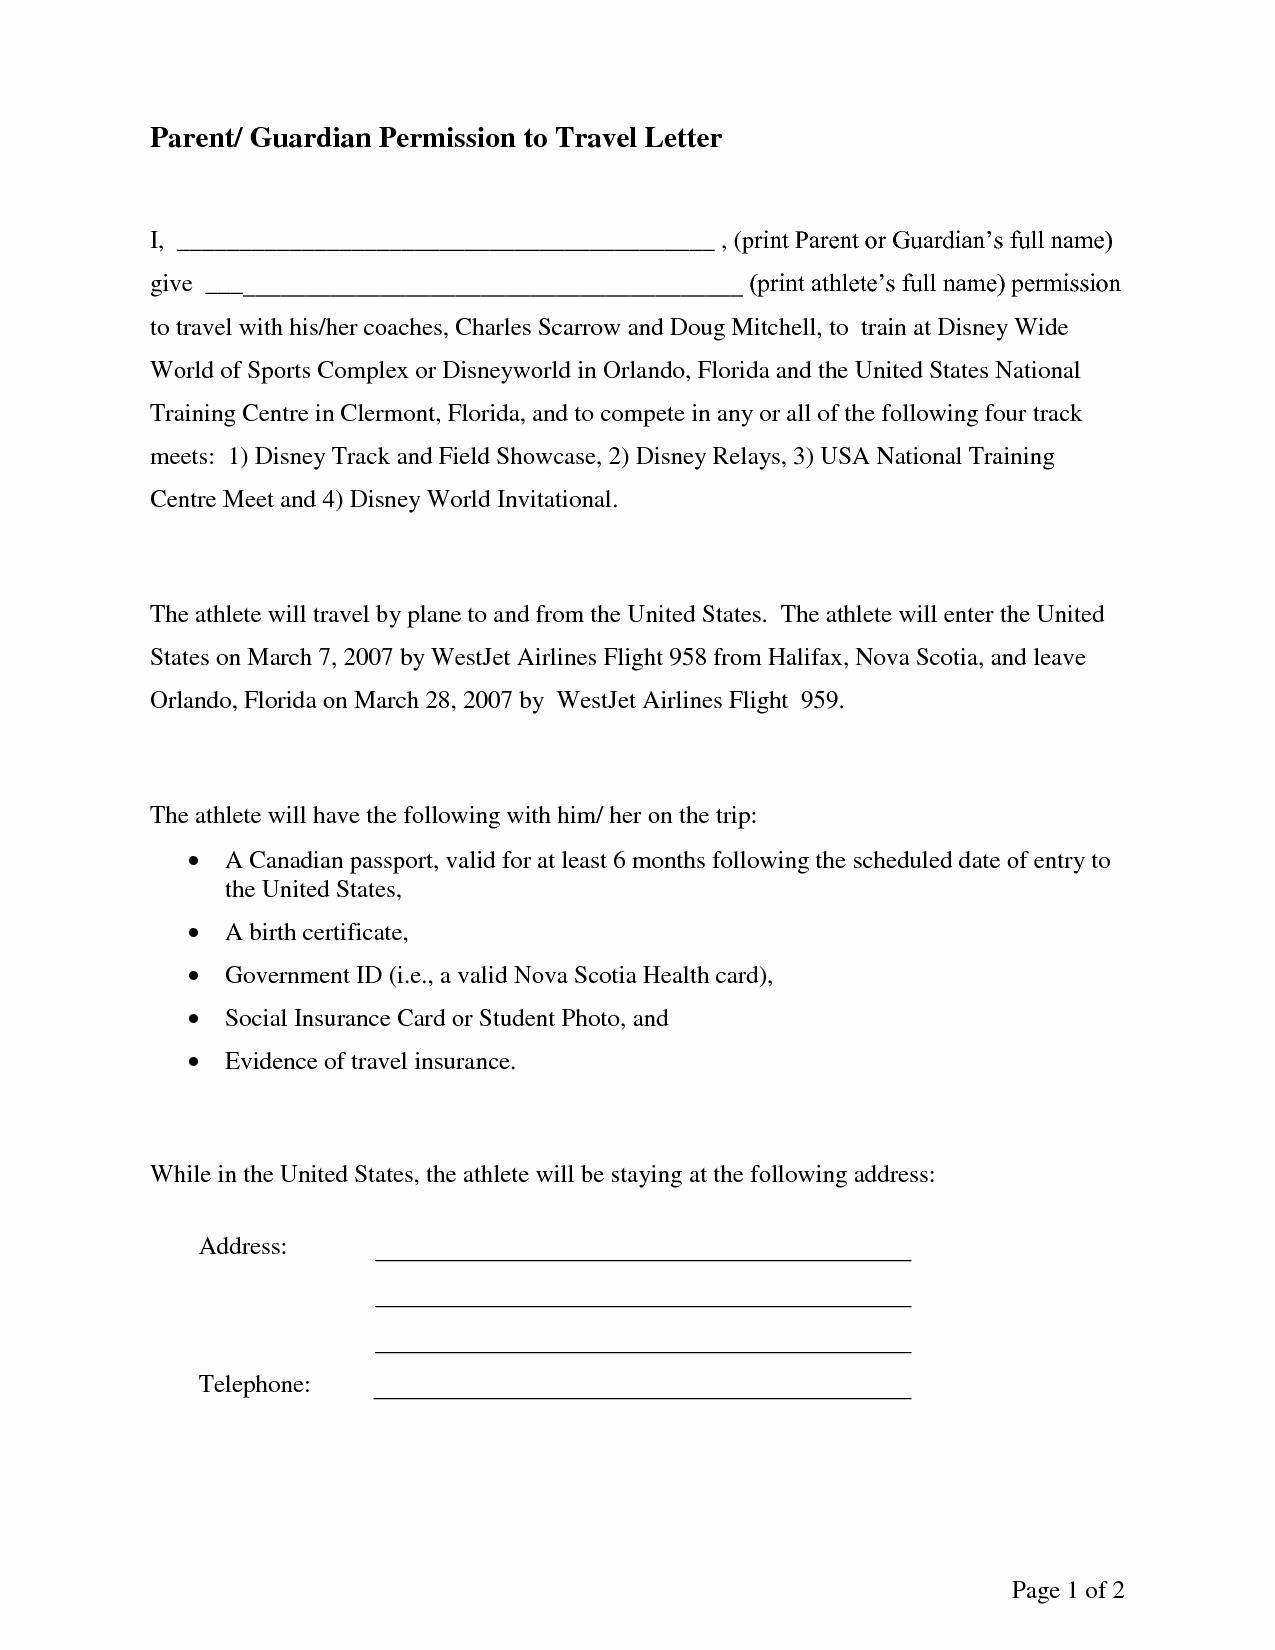 Parental Consent forms Template Lovely Parental Consent Permission Letter Sample